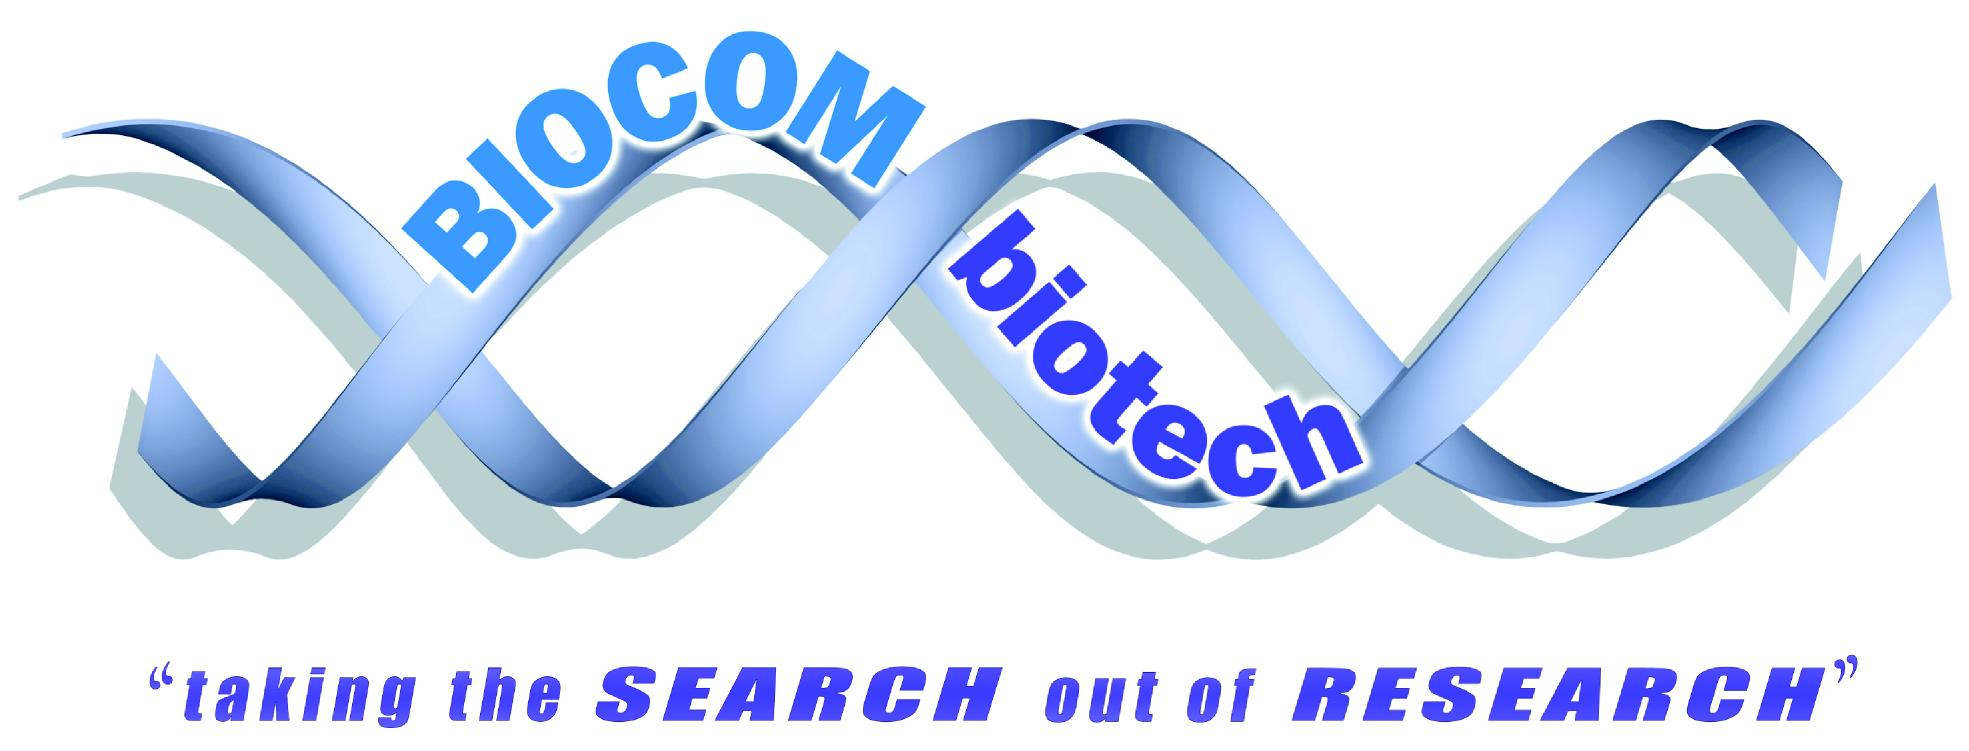 BIOCOM_biotechADJ-Converte.jpg